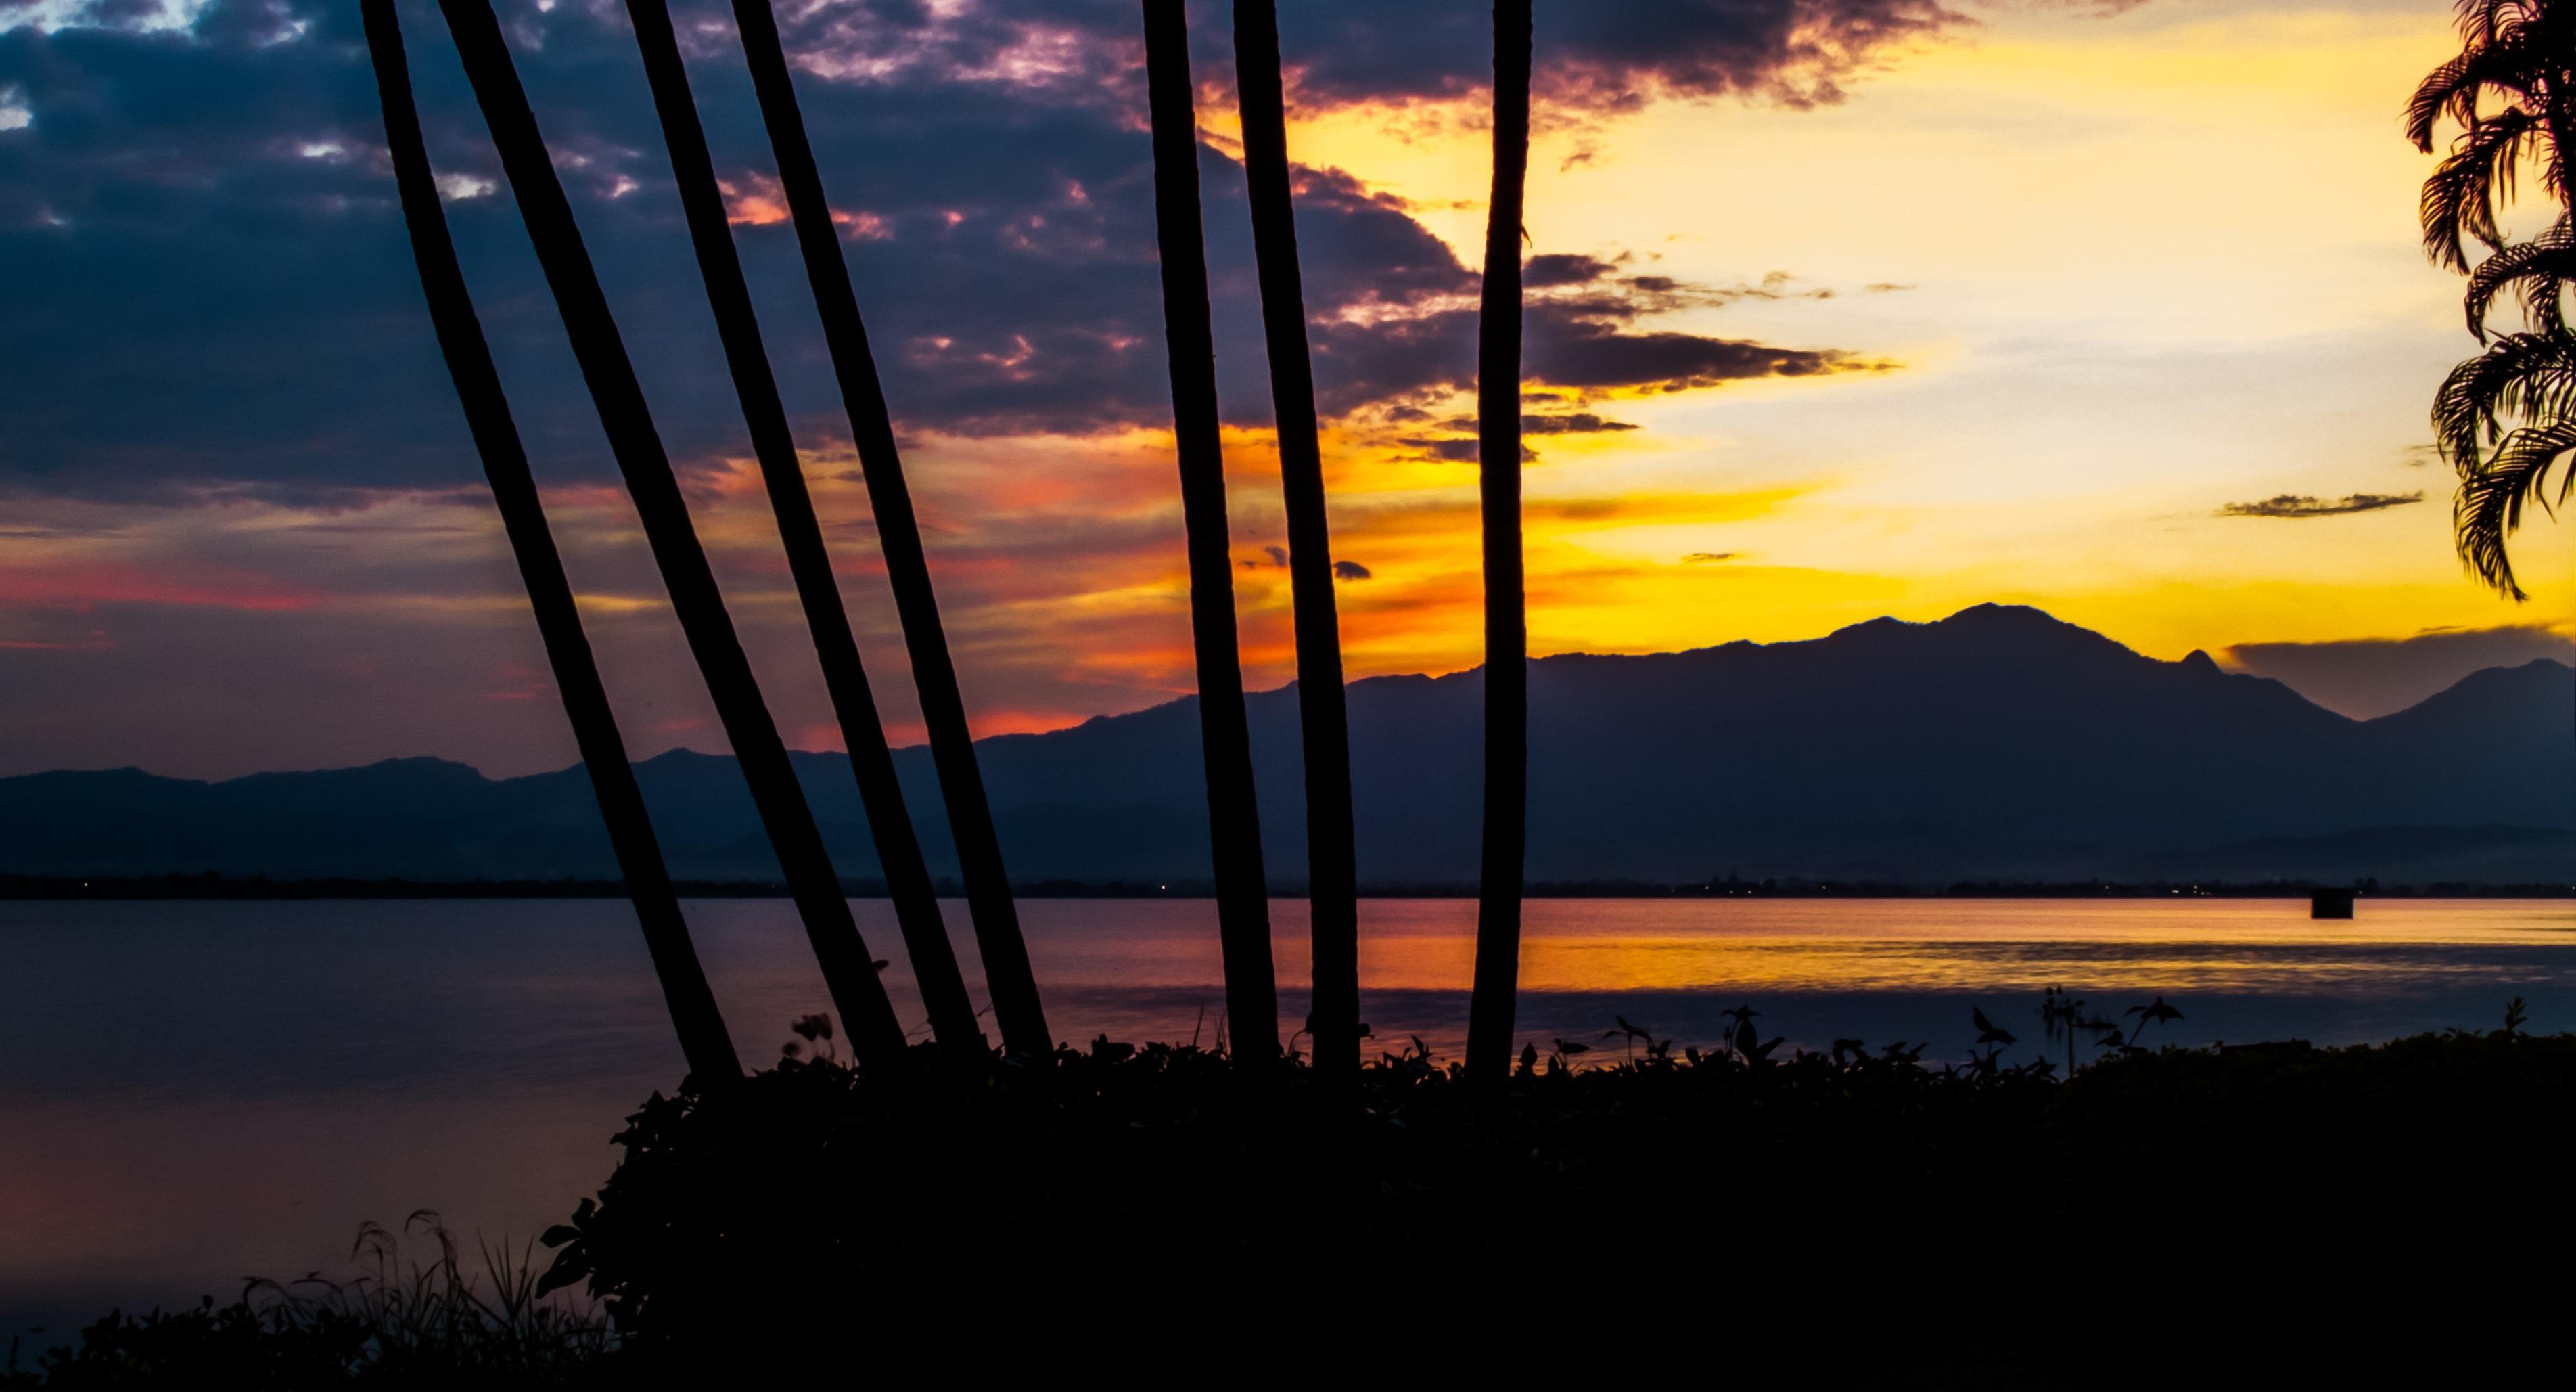 Gambar Air Horison Awan Langit Matahari Terbit Matahari